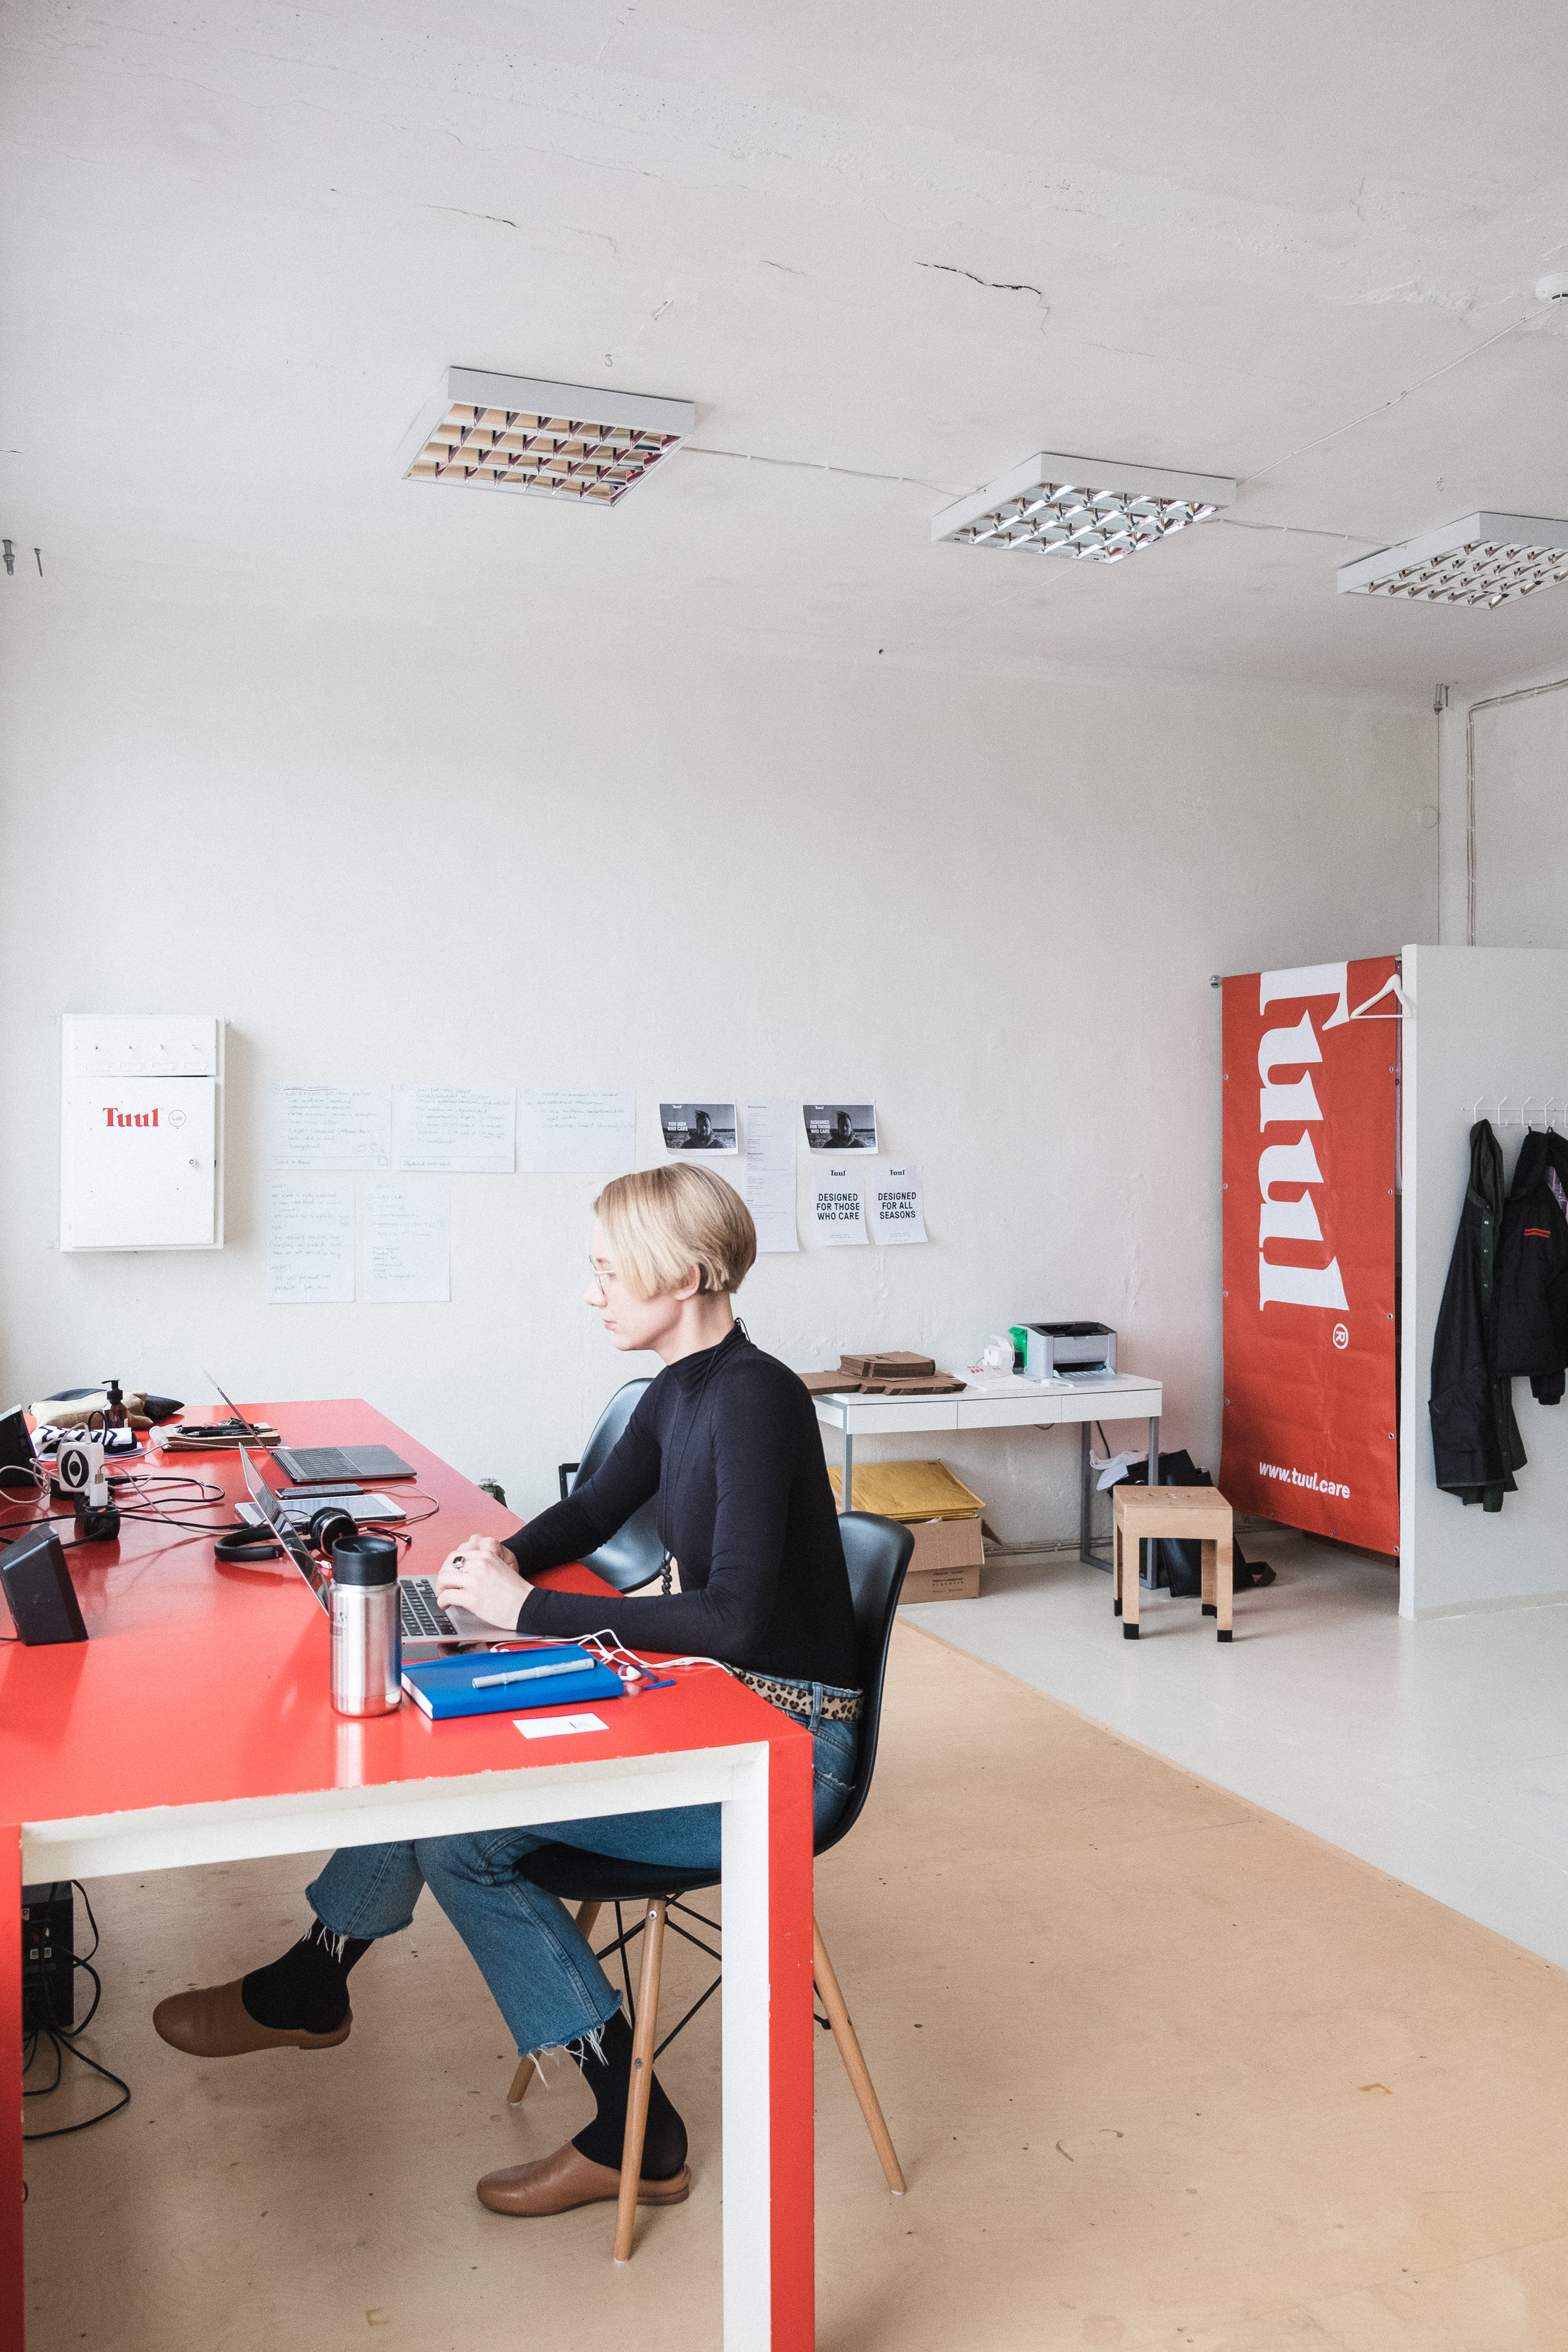 Our Office at Telliskivi Creative City / Tuul - Organic Skincare for Men